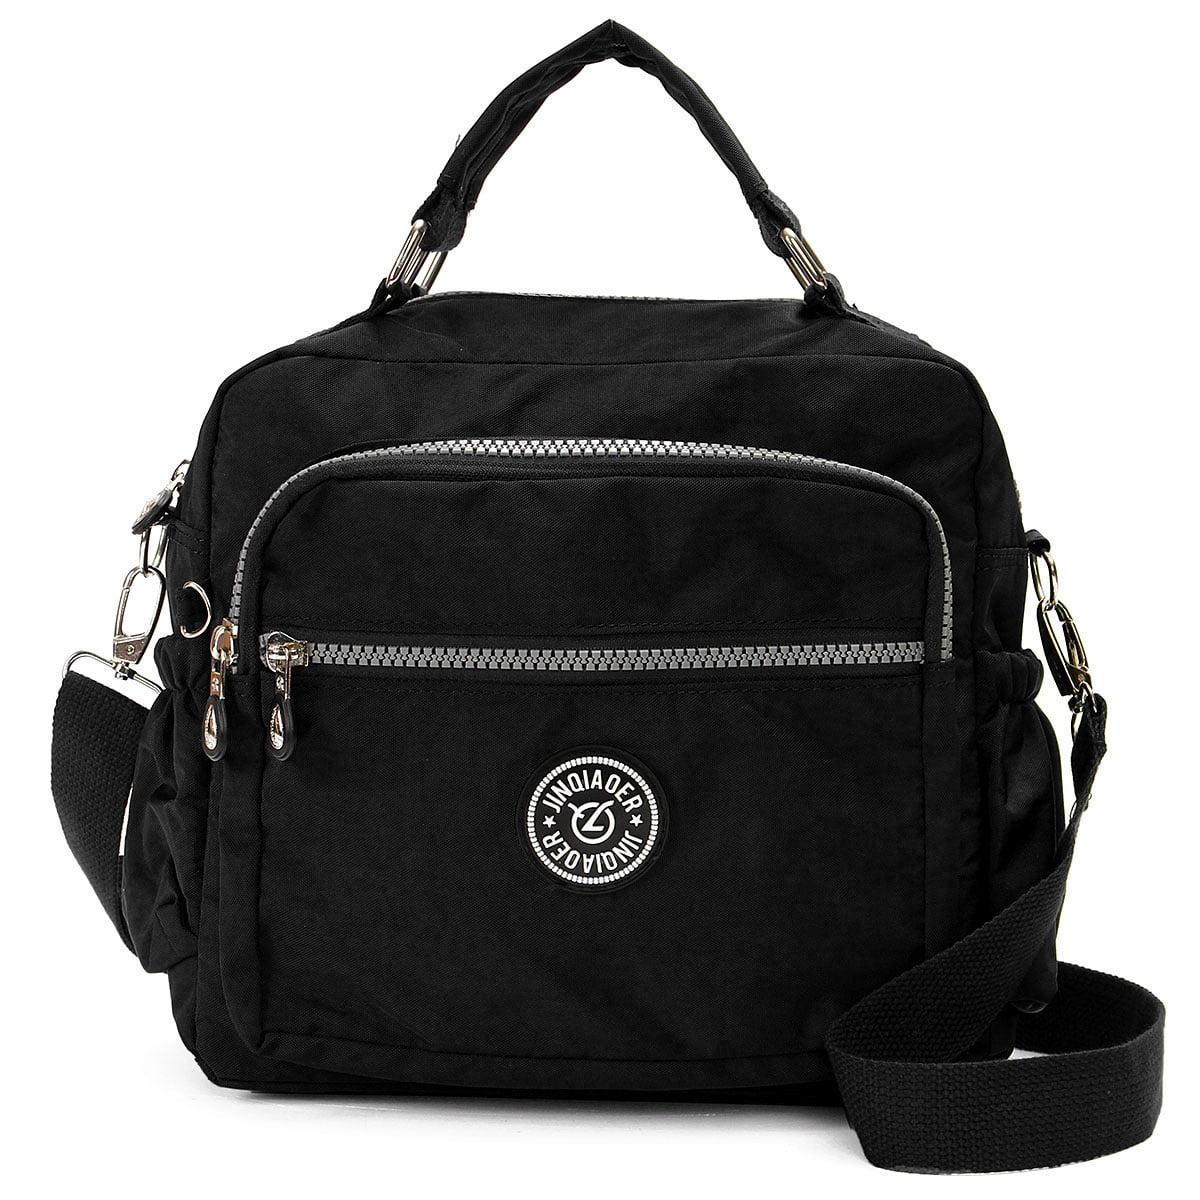 Purses & Handbags for Women